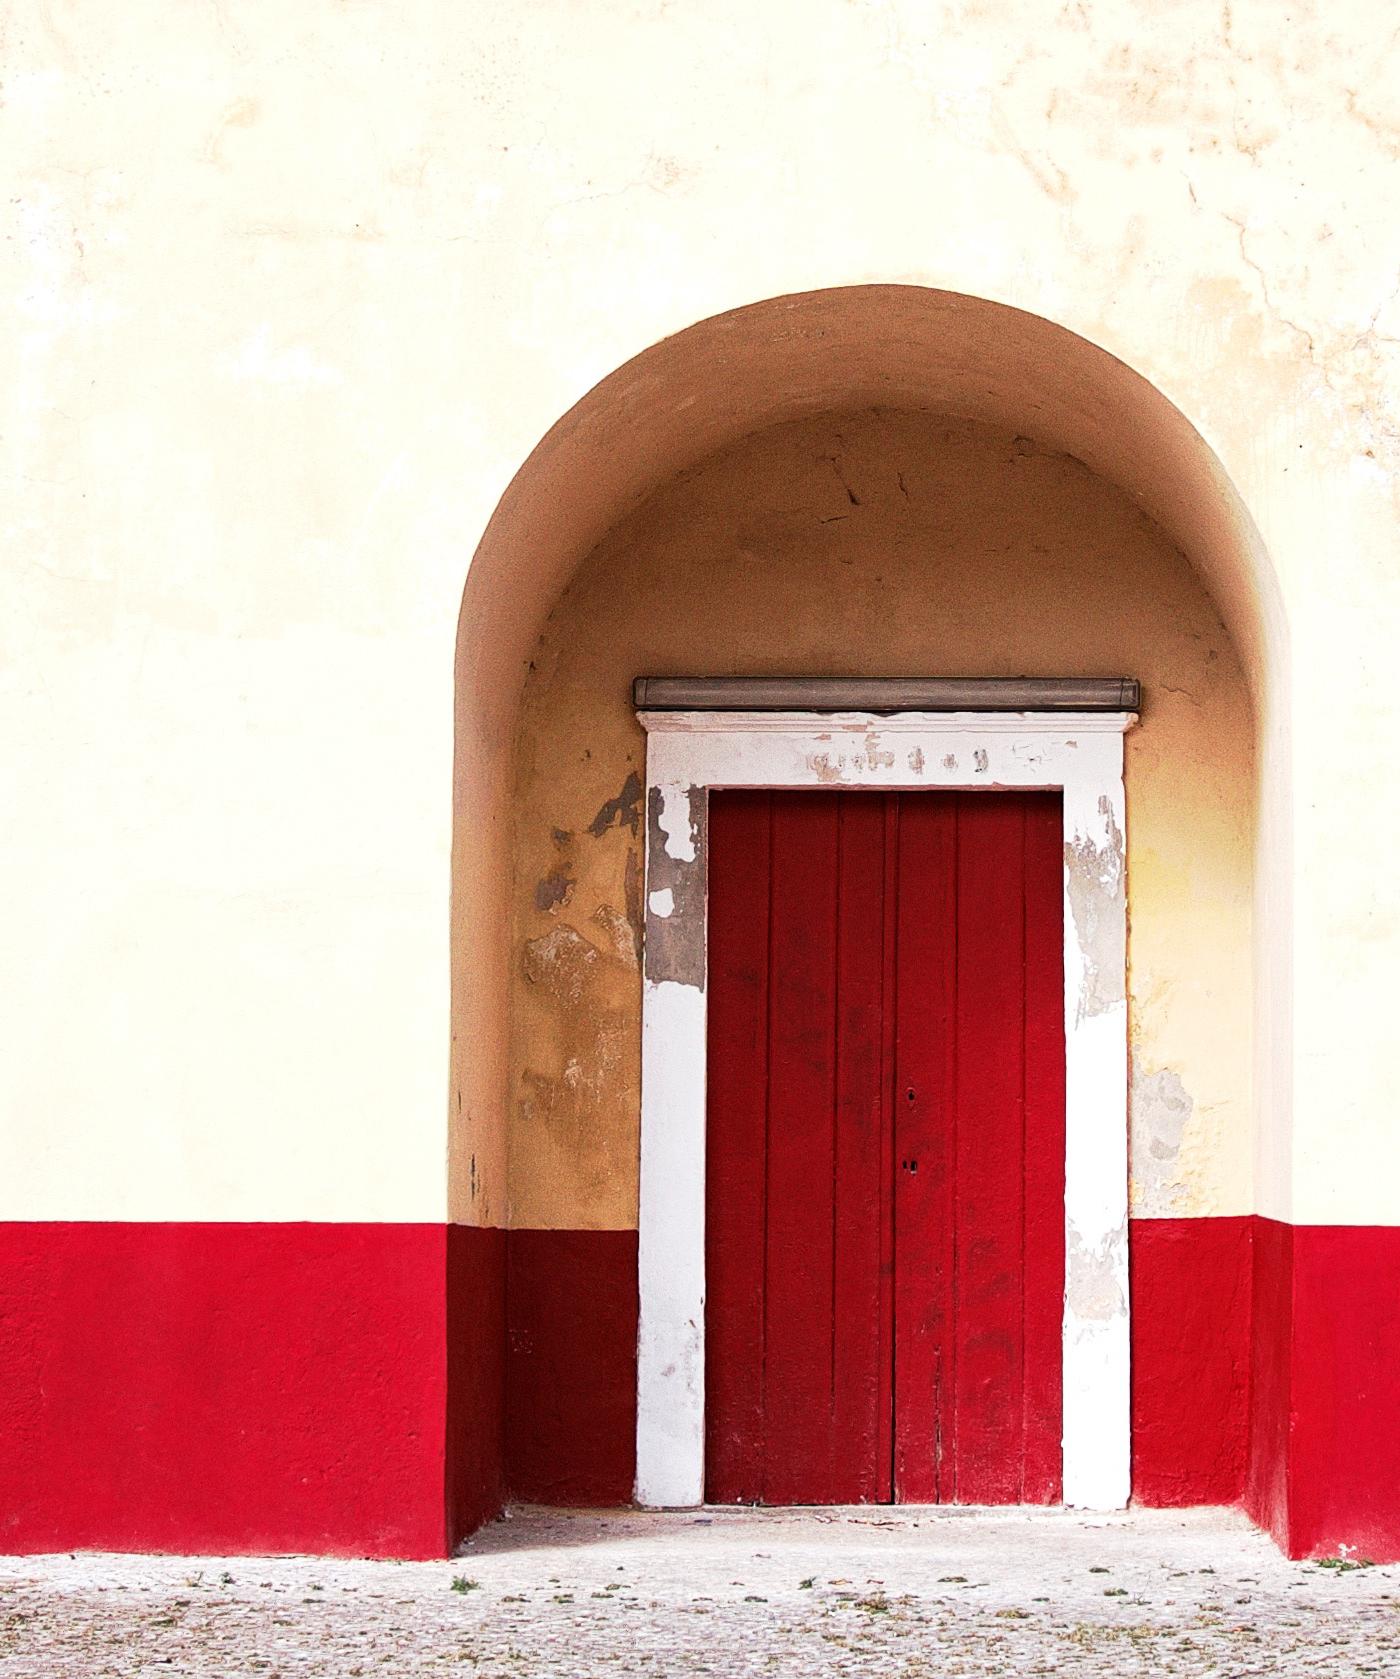 shut-the-dang-door-beth-wonson-108416-unsplash.jpg